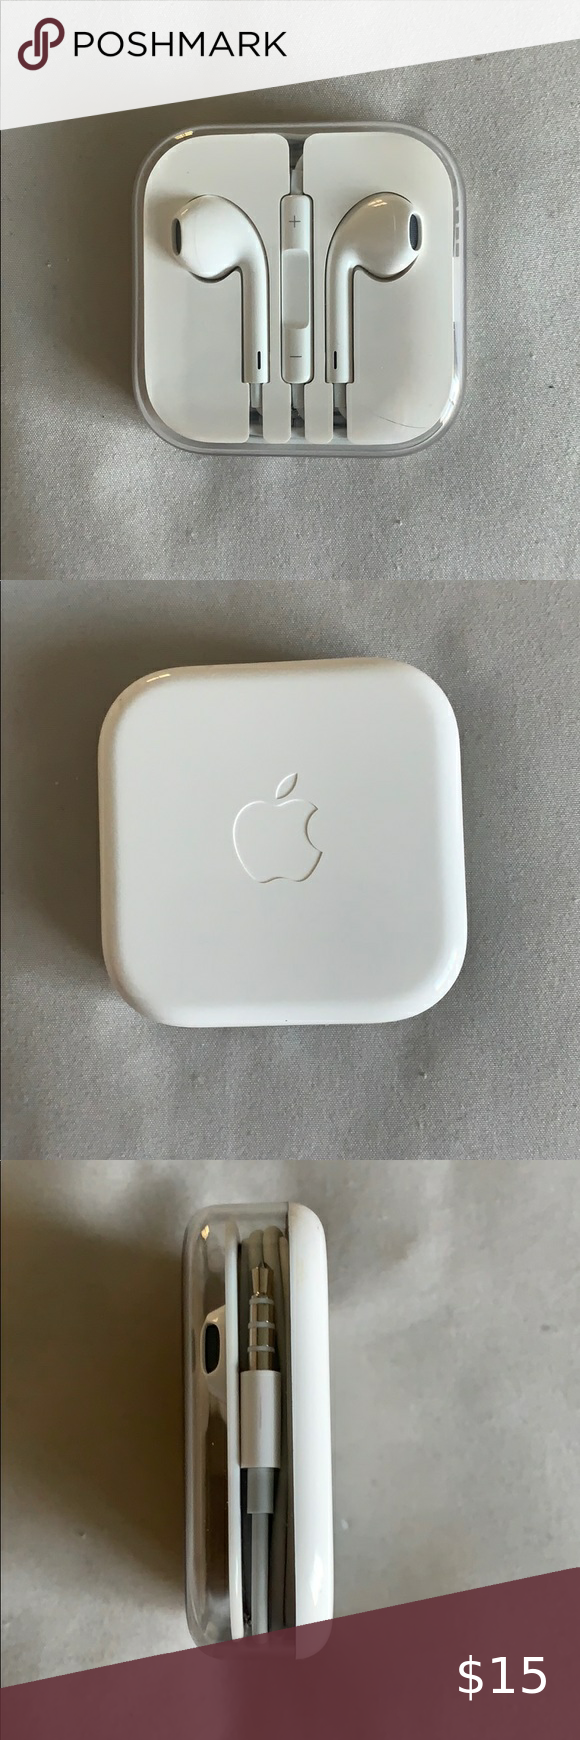 Nwot Apple Earphones Earpods Nwot Apple Earpods With Headphone Plug Remote And Mic Built In Can Use Headphone Jack Adapter For Apple Earphones Earphone Apple